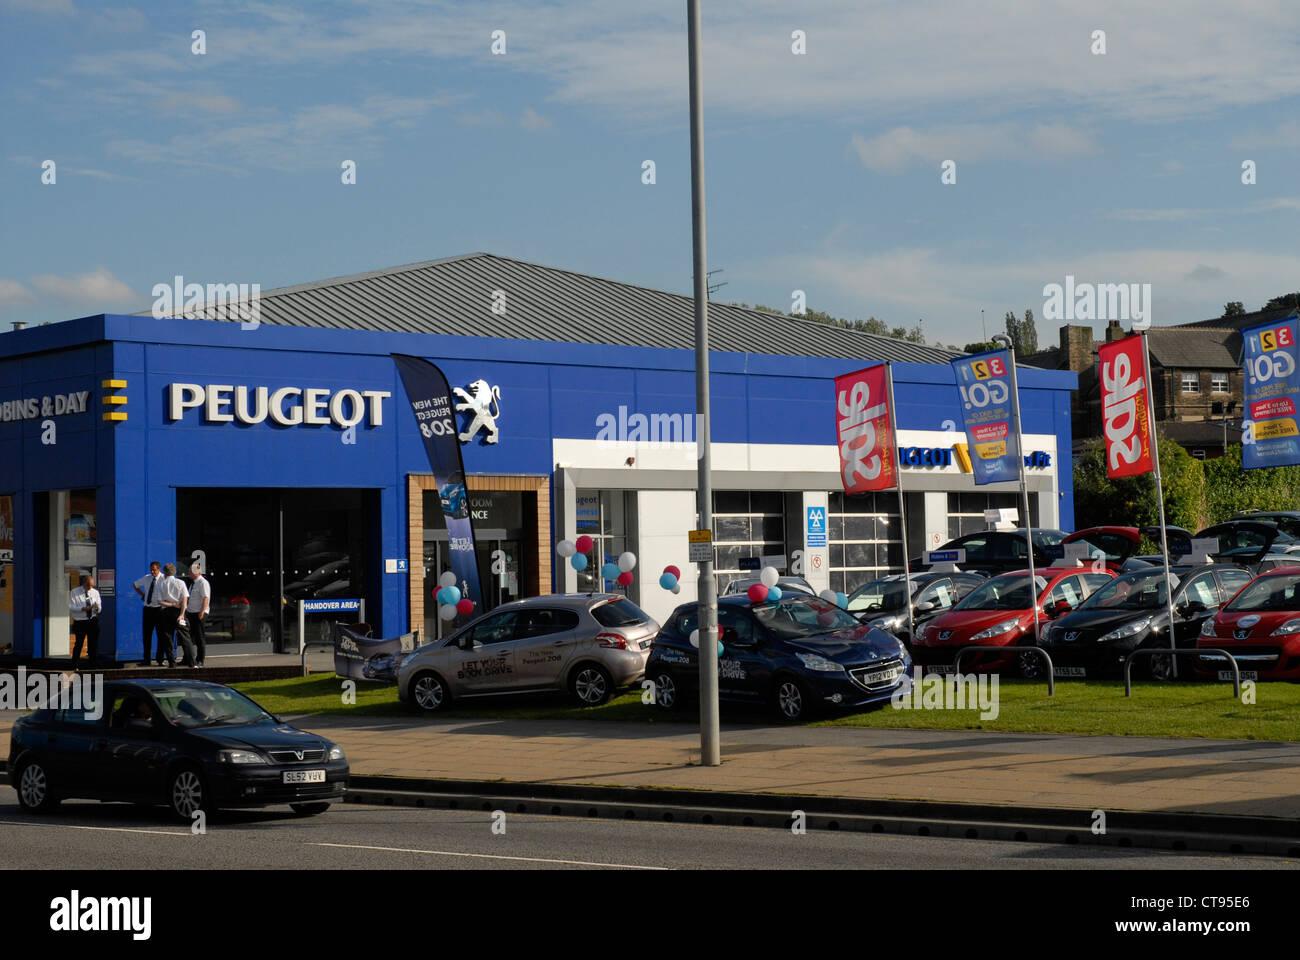 Peugeot Garage Amsterdam : Peugeot showroom stock photos peugeot showroom stock images alamy